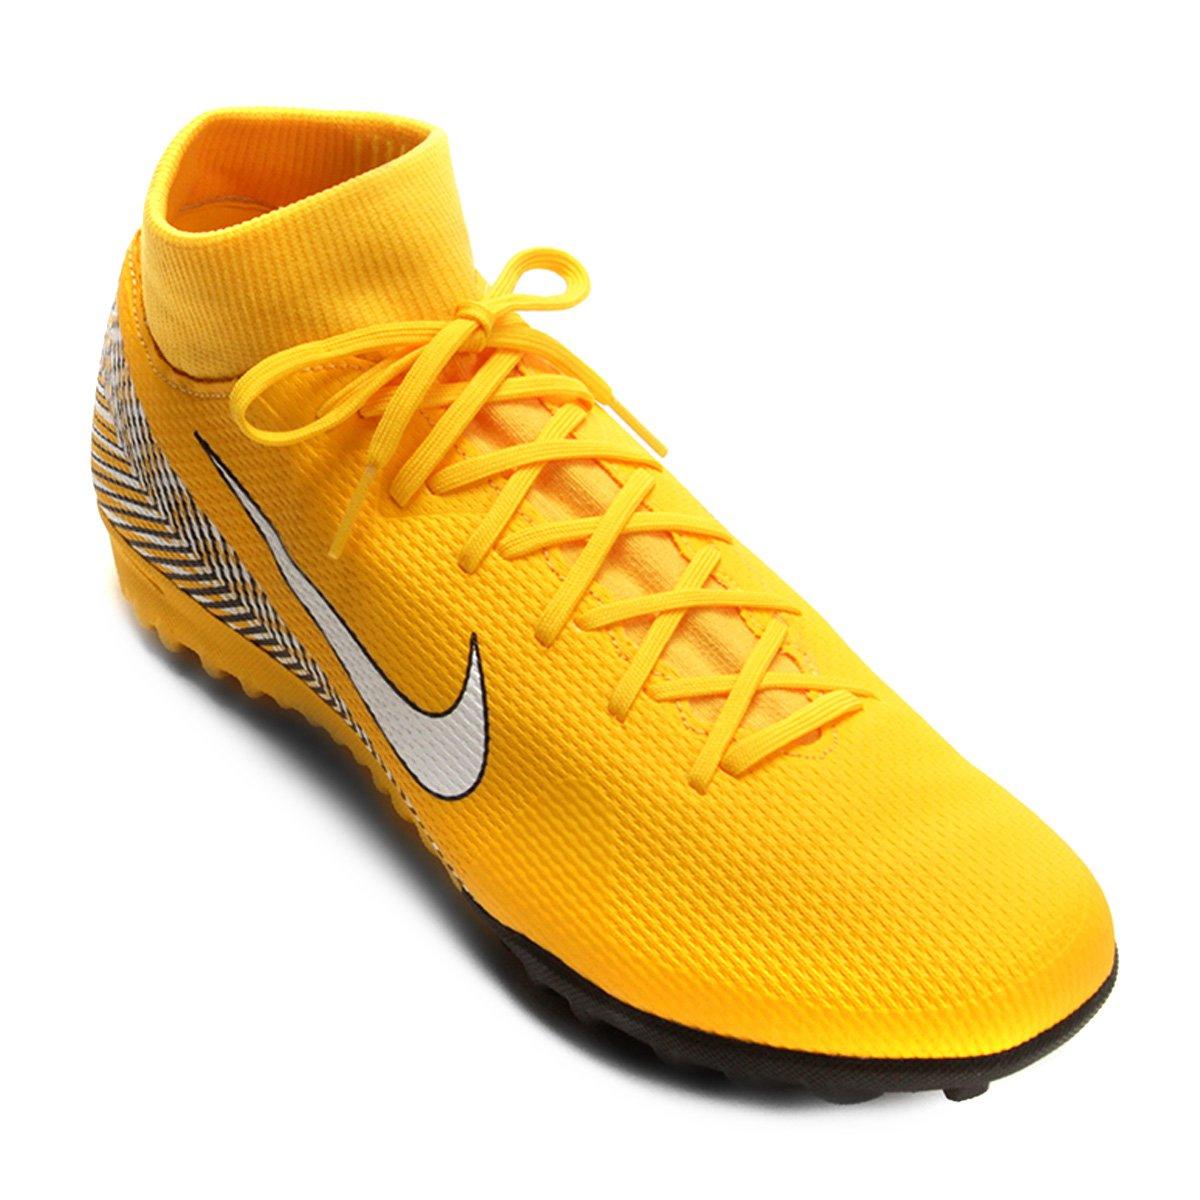 c4e7f440c06f2 Chuteira Society Nike Mercurial Superfly 6 Academy Neymar TF | Allianz  Parque Shop